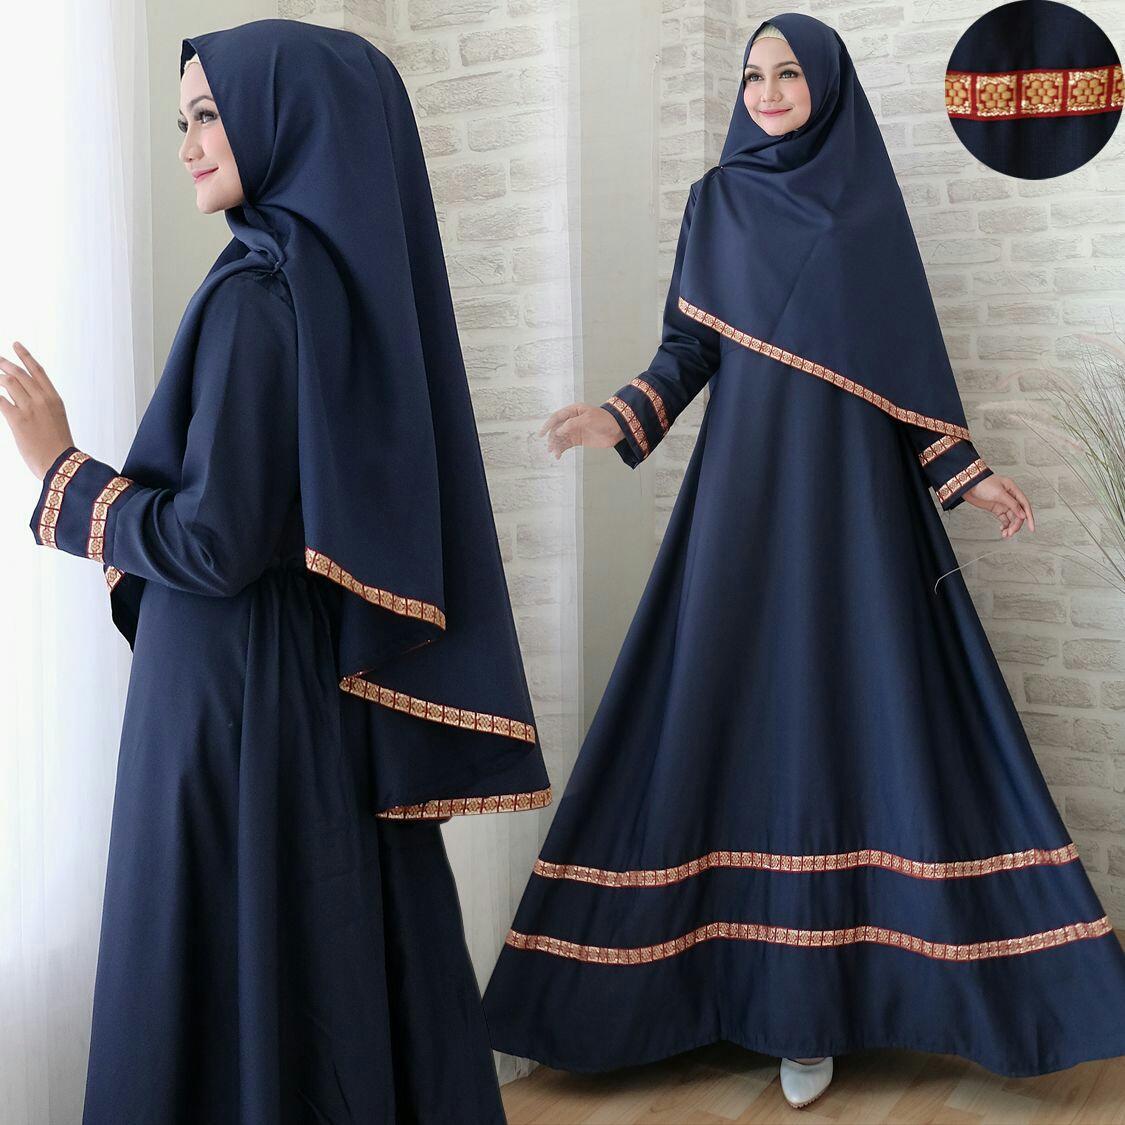 Snowshop Gamis Syari 2in1 Jasmine ( Dapat JIlbab ) - Full Balotely Kombinasi Pita Songket / Maxi Muslim / Baju Muslim / Stelan Muslim / Dress Muslim / Gaun / Pasmina / Fashion Muslim / Balotelly